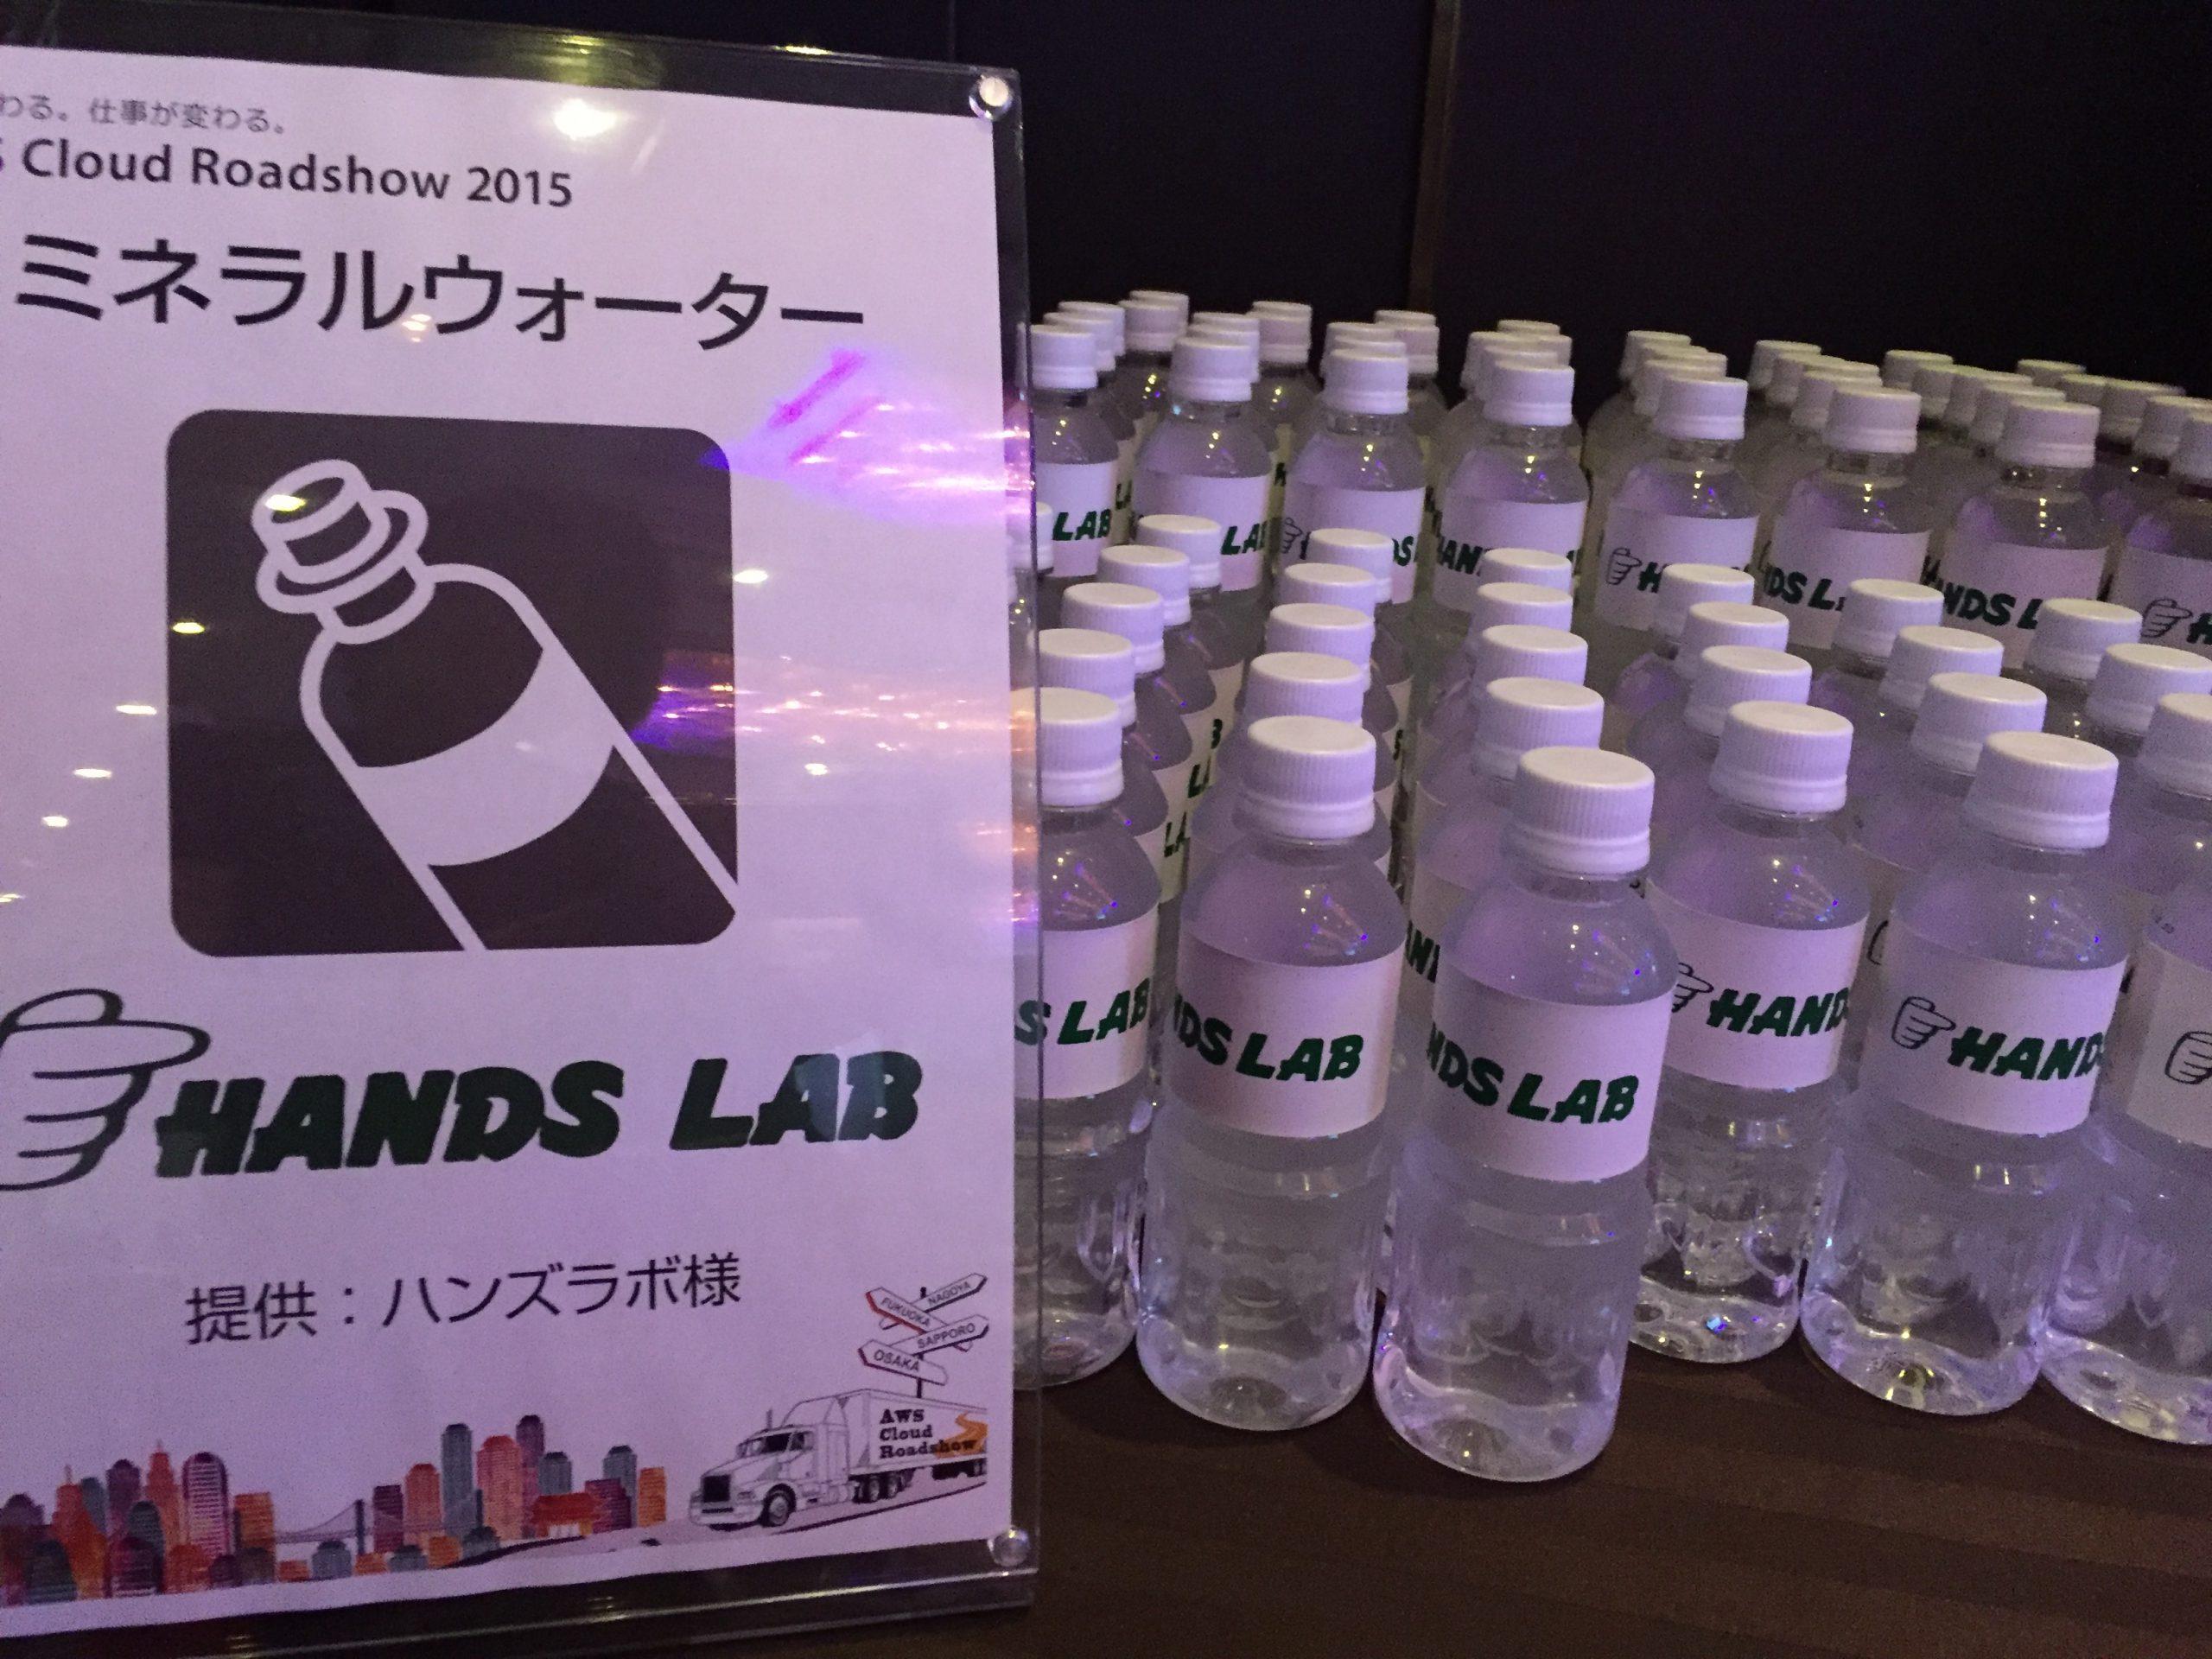 AWS CloudRoadshow福岡に協賛しました